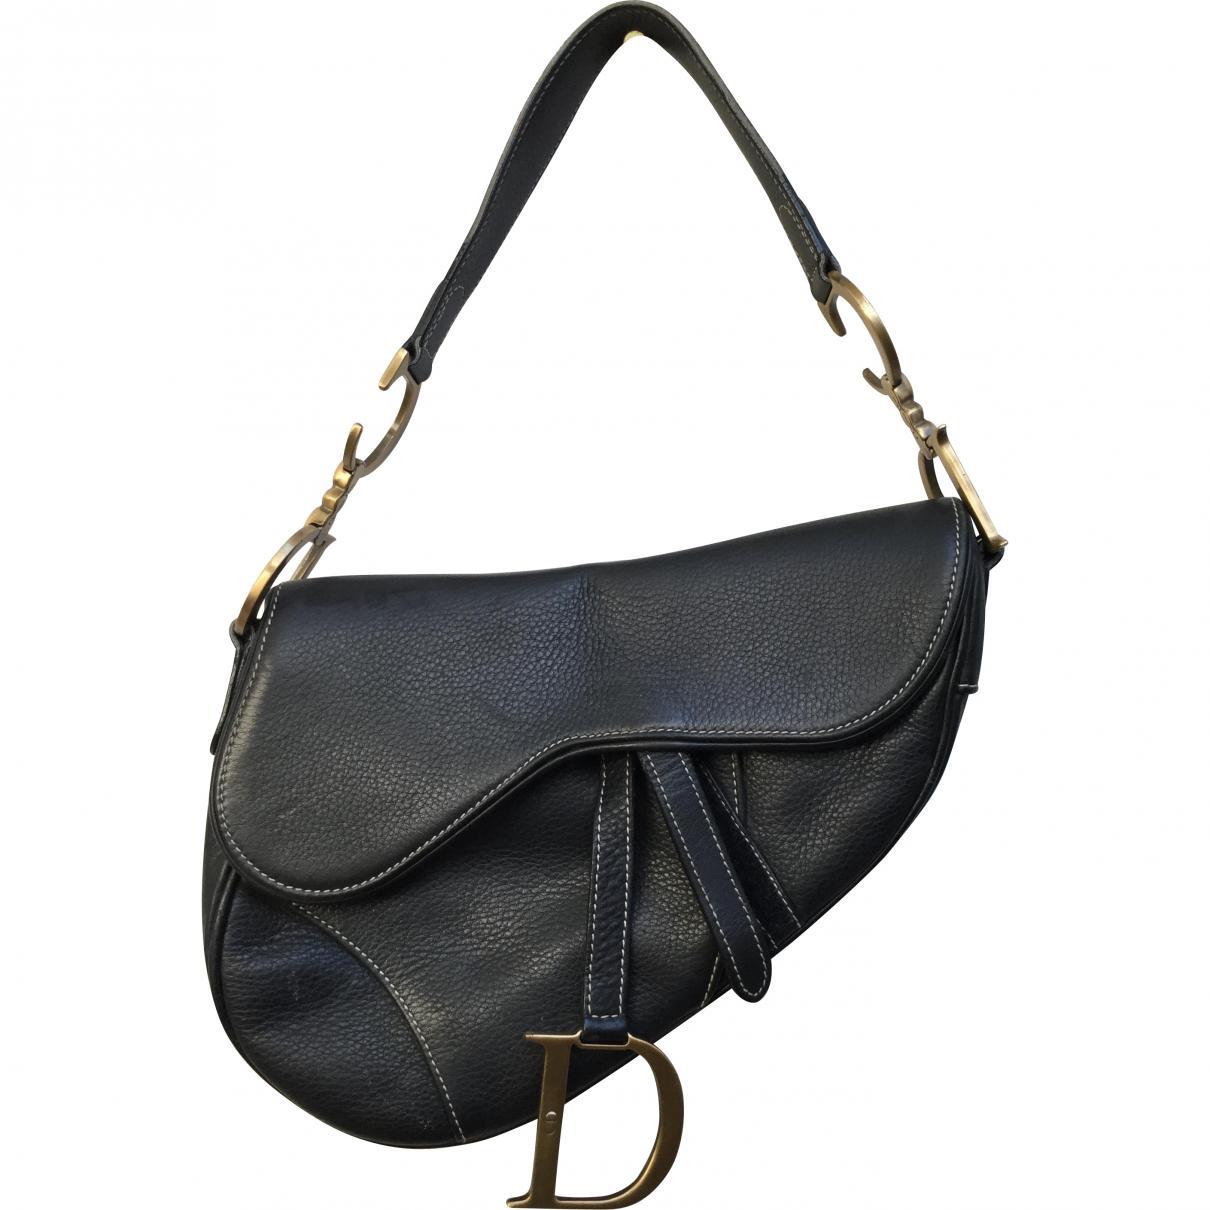 Dior. Women s Vintage Saddle Black Leather Handbag. £880 From Vestiaire  Collective 5f23c5b11b89d